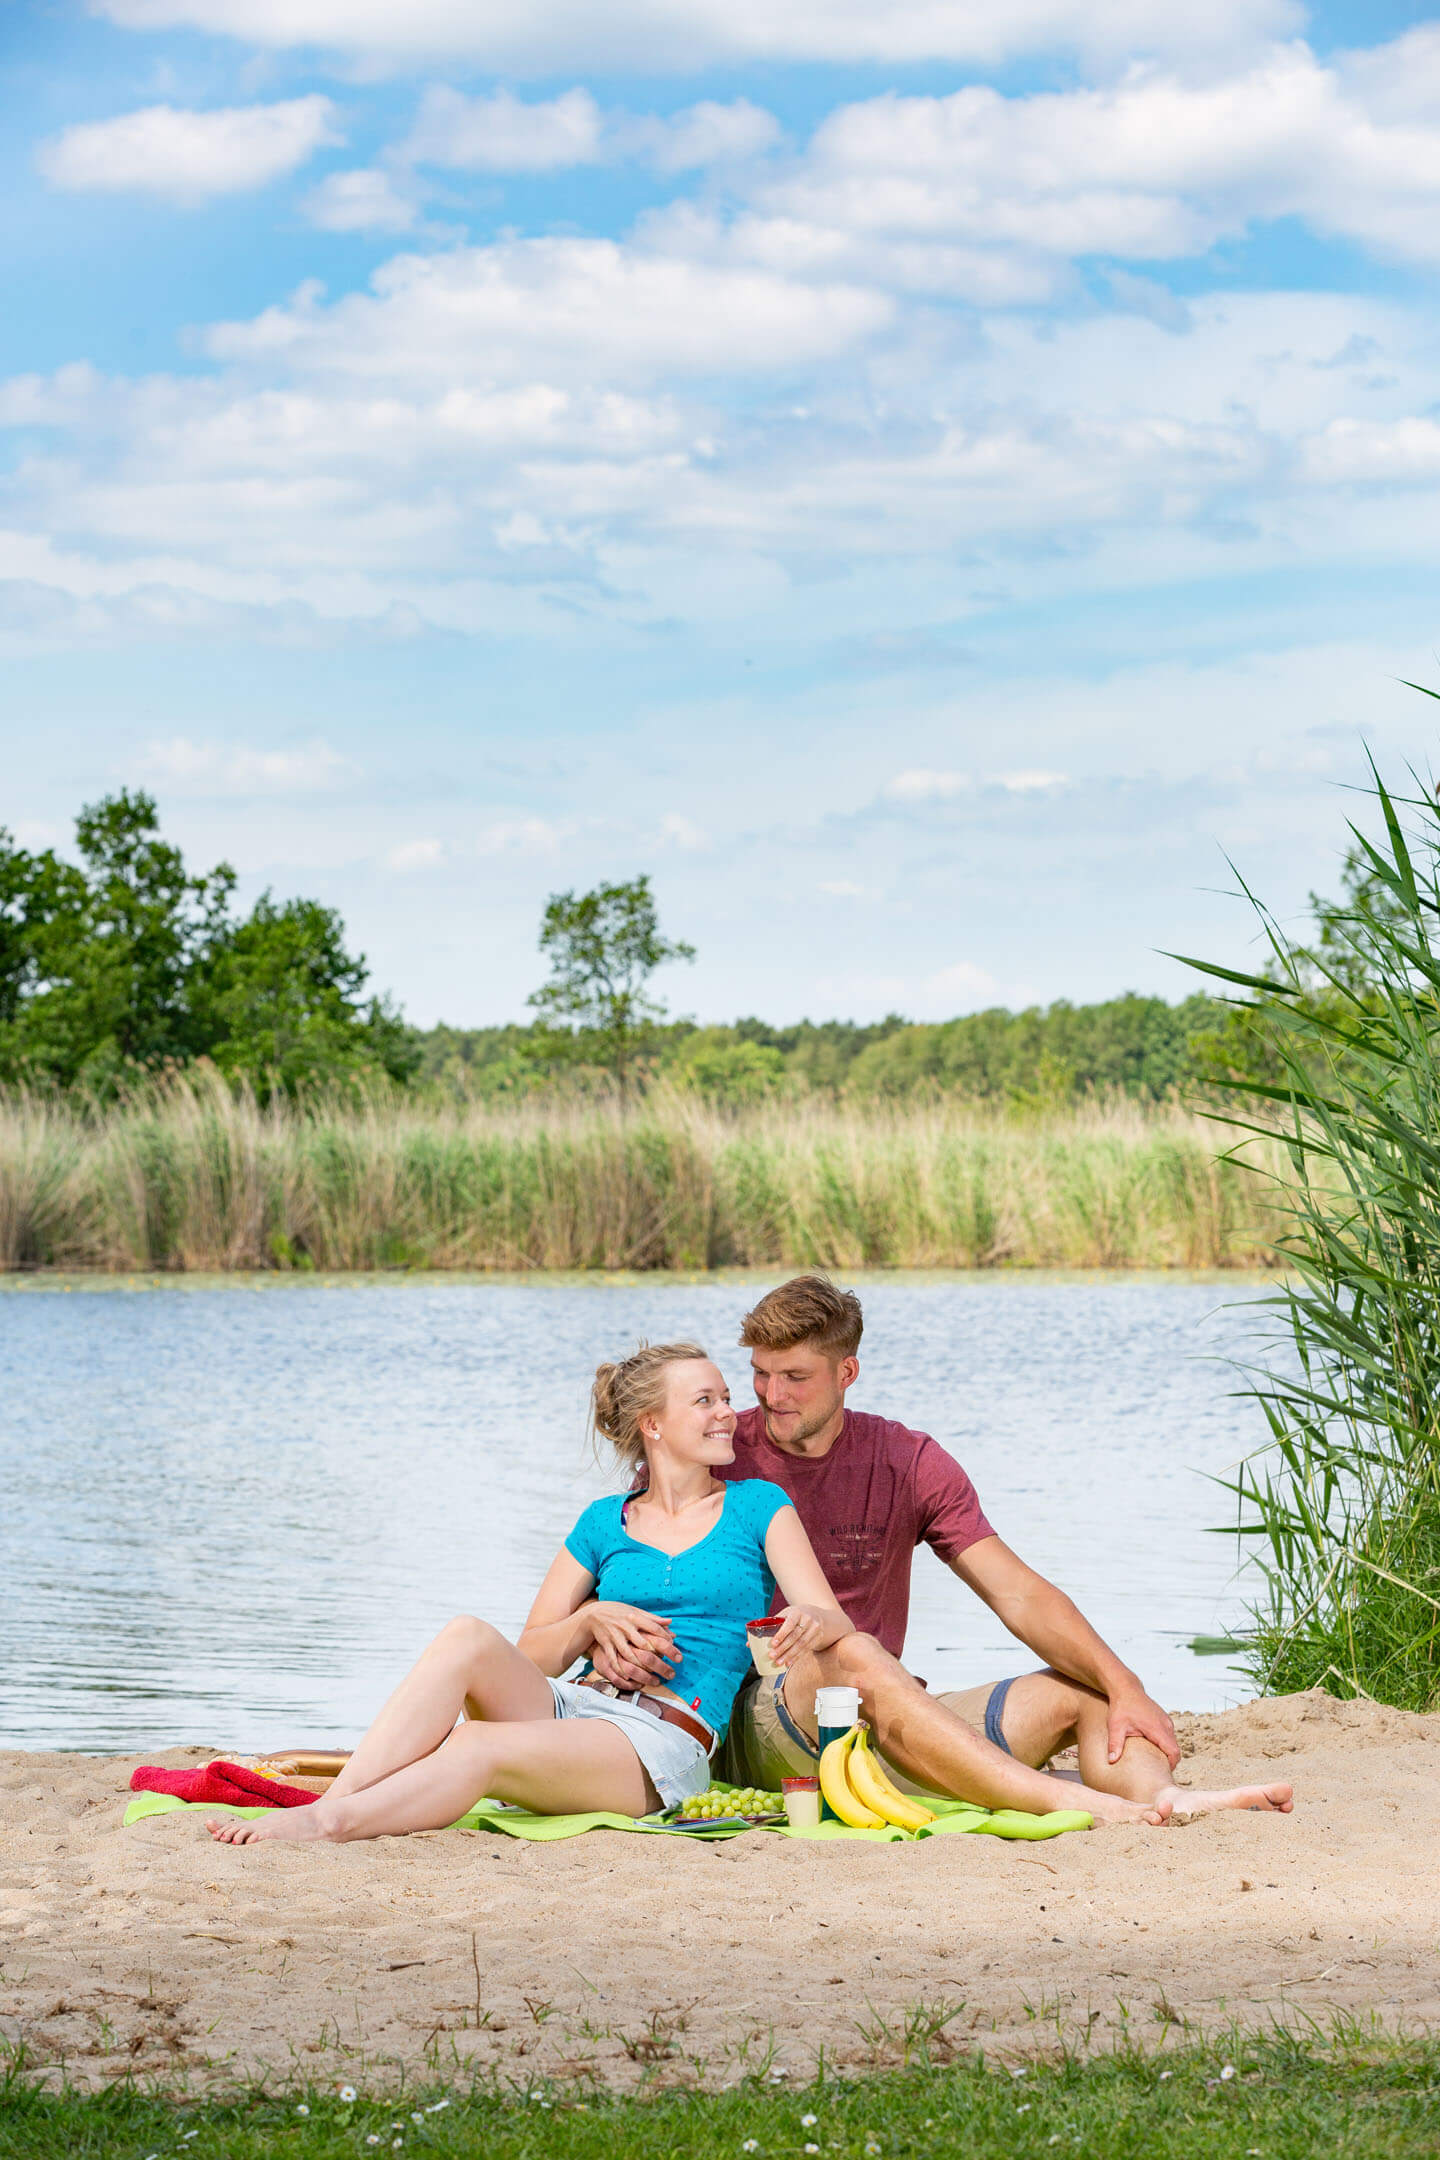 Junges Paar am Ufer der Spree. Fotograf: Florian Läufer